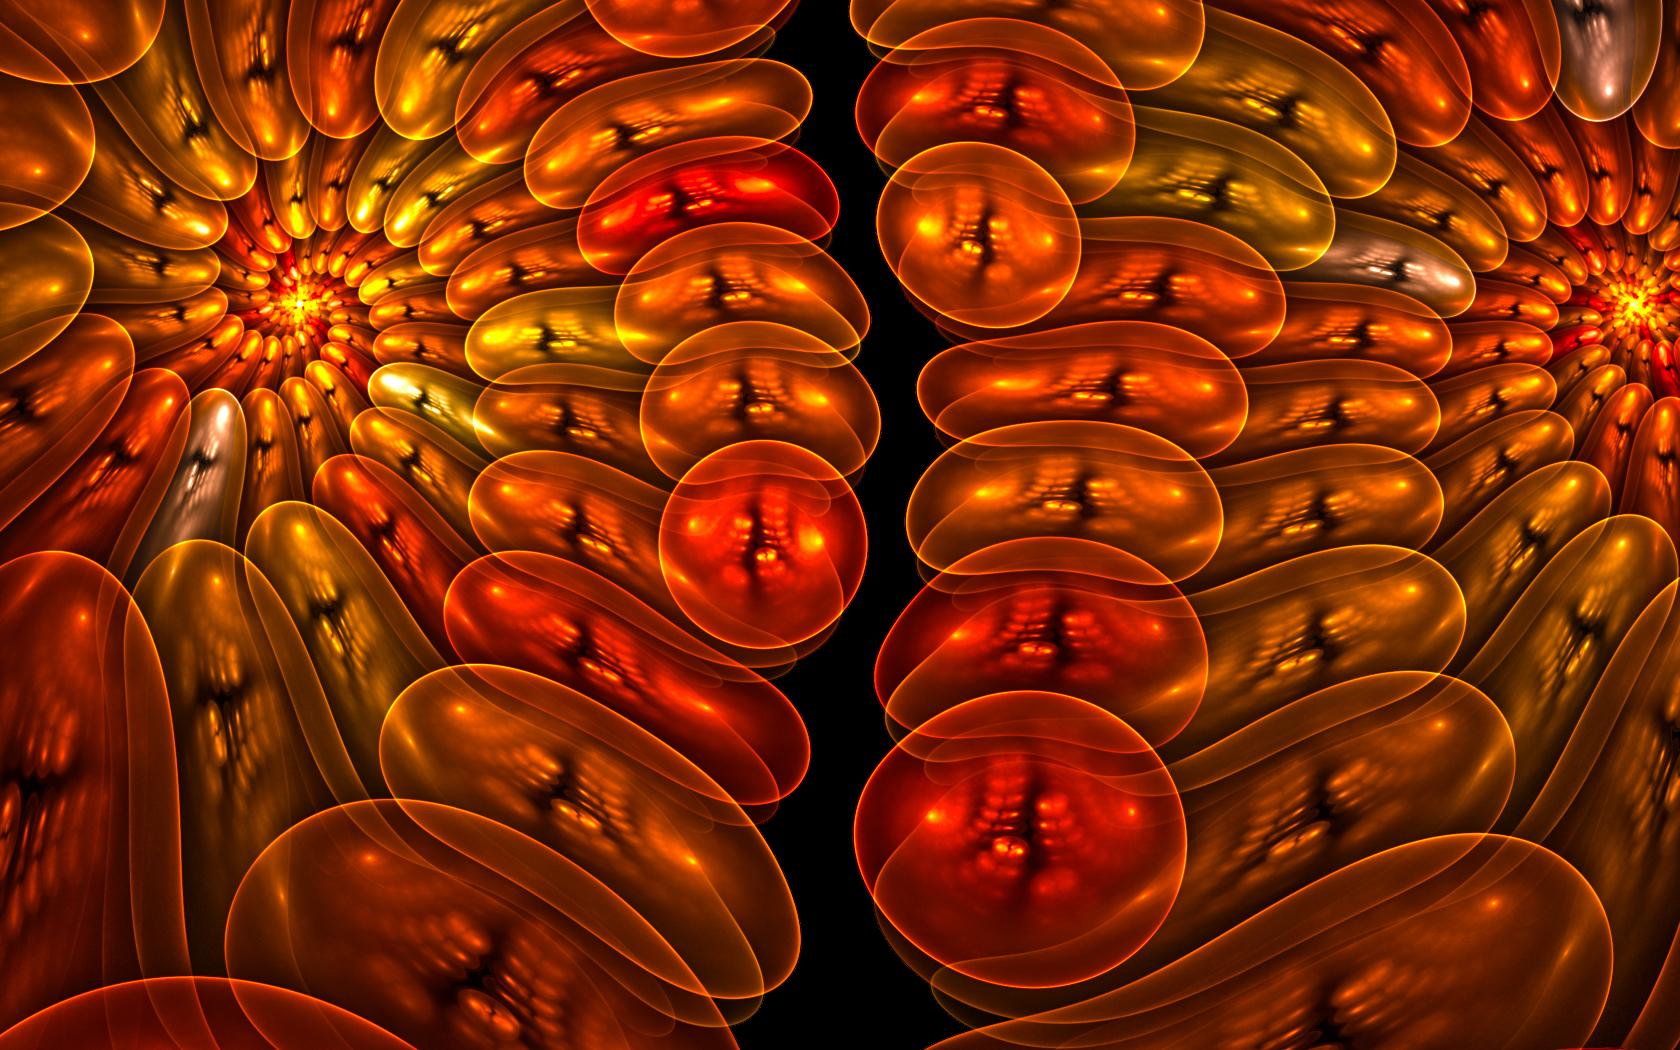 Hot Lava Bubbles by Anyzamarah